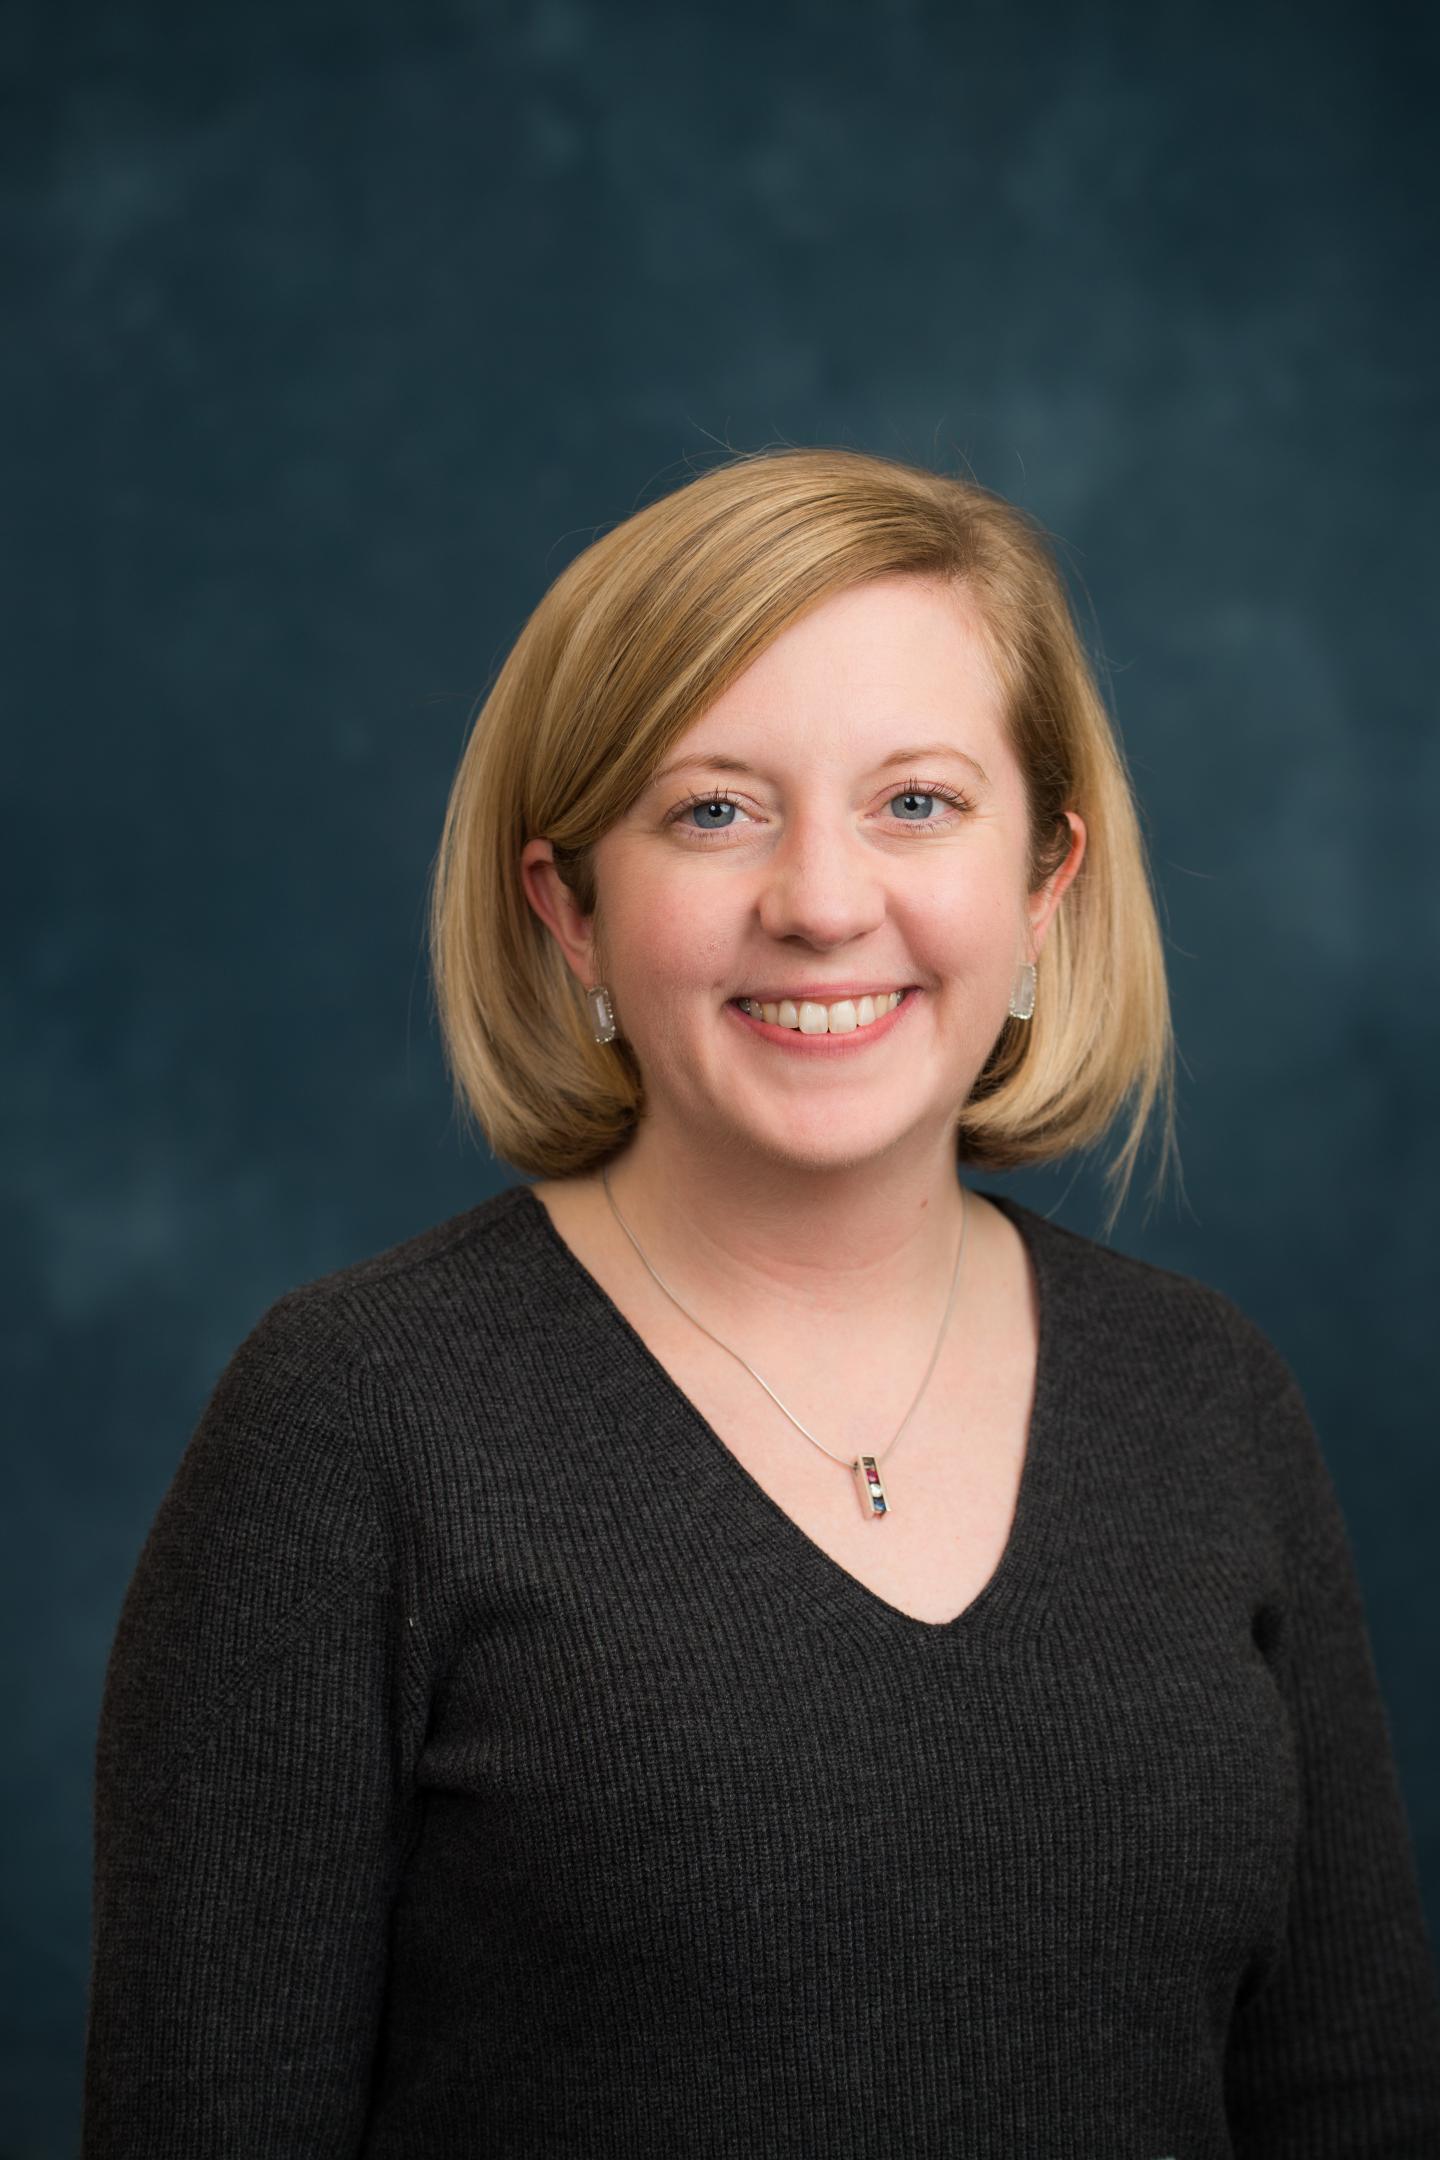 Erin Cobain, M.D., Michigan Medicine – University of Michigan